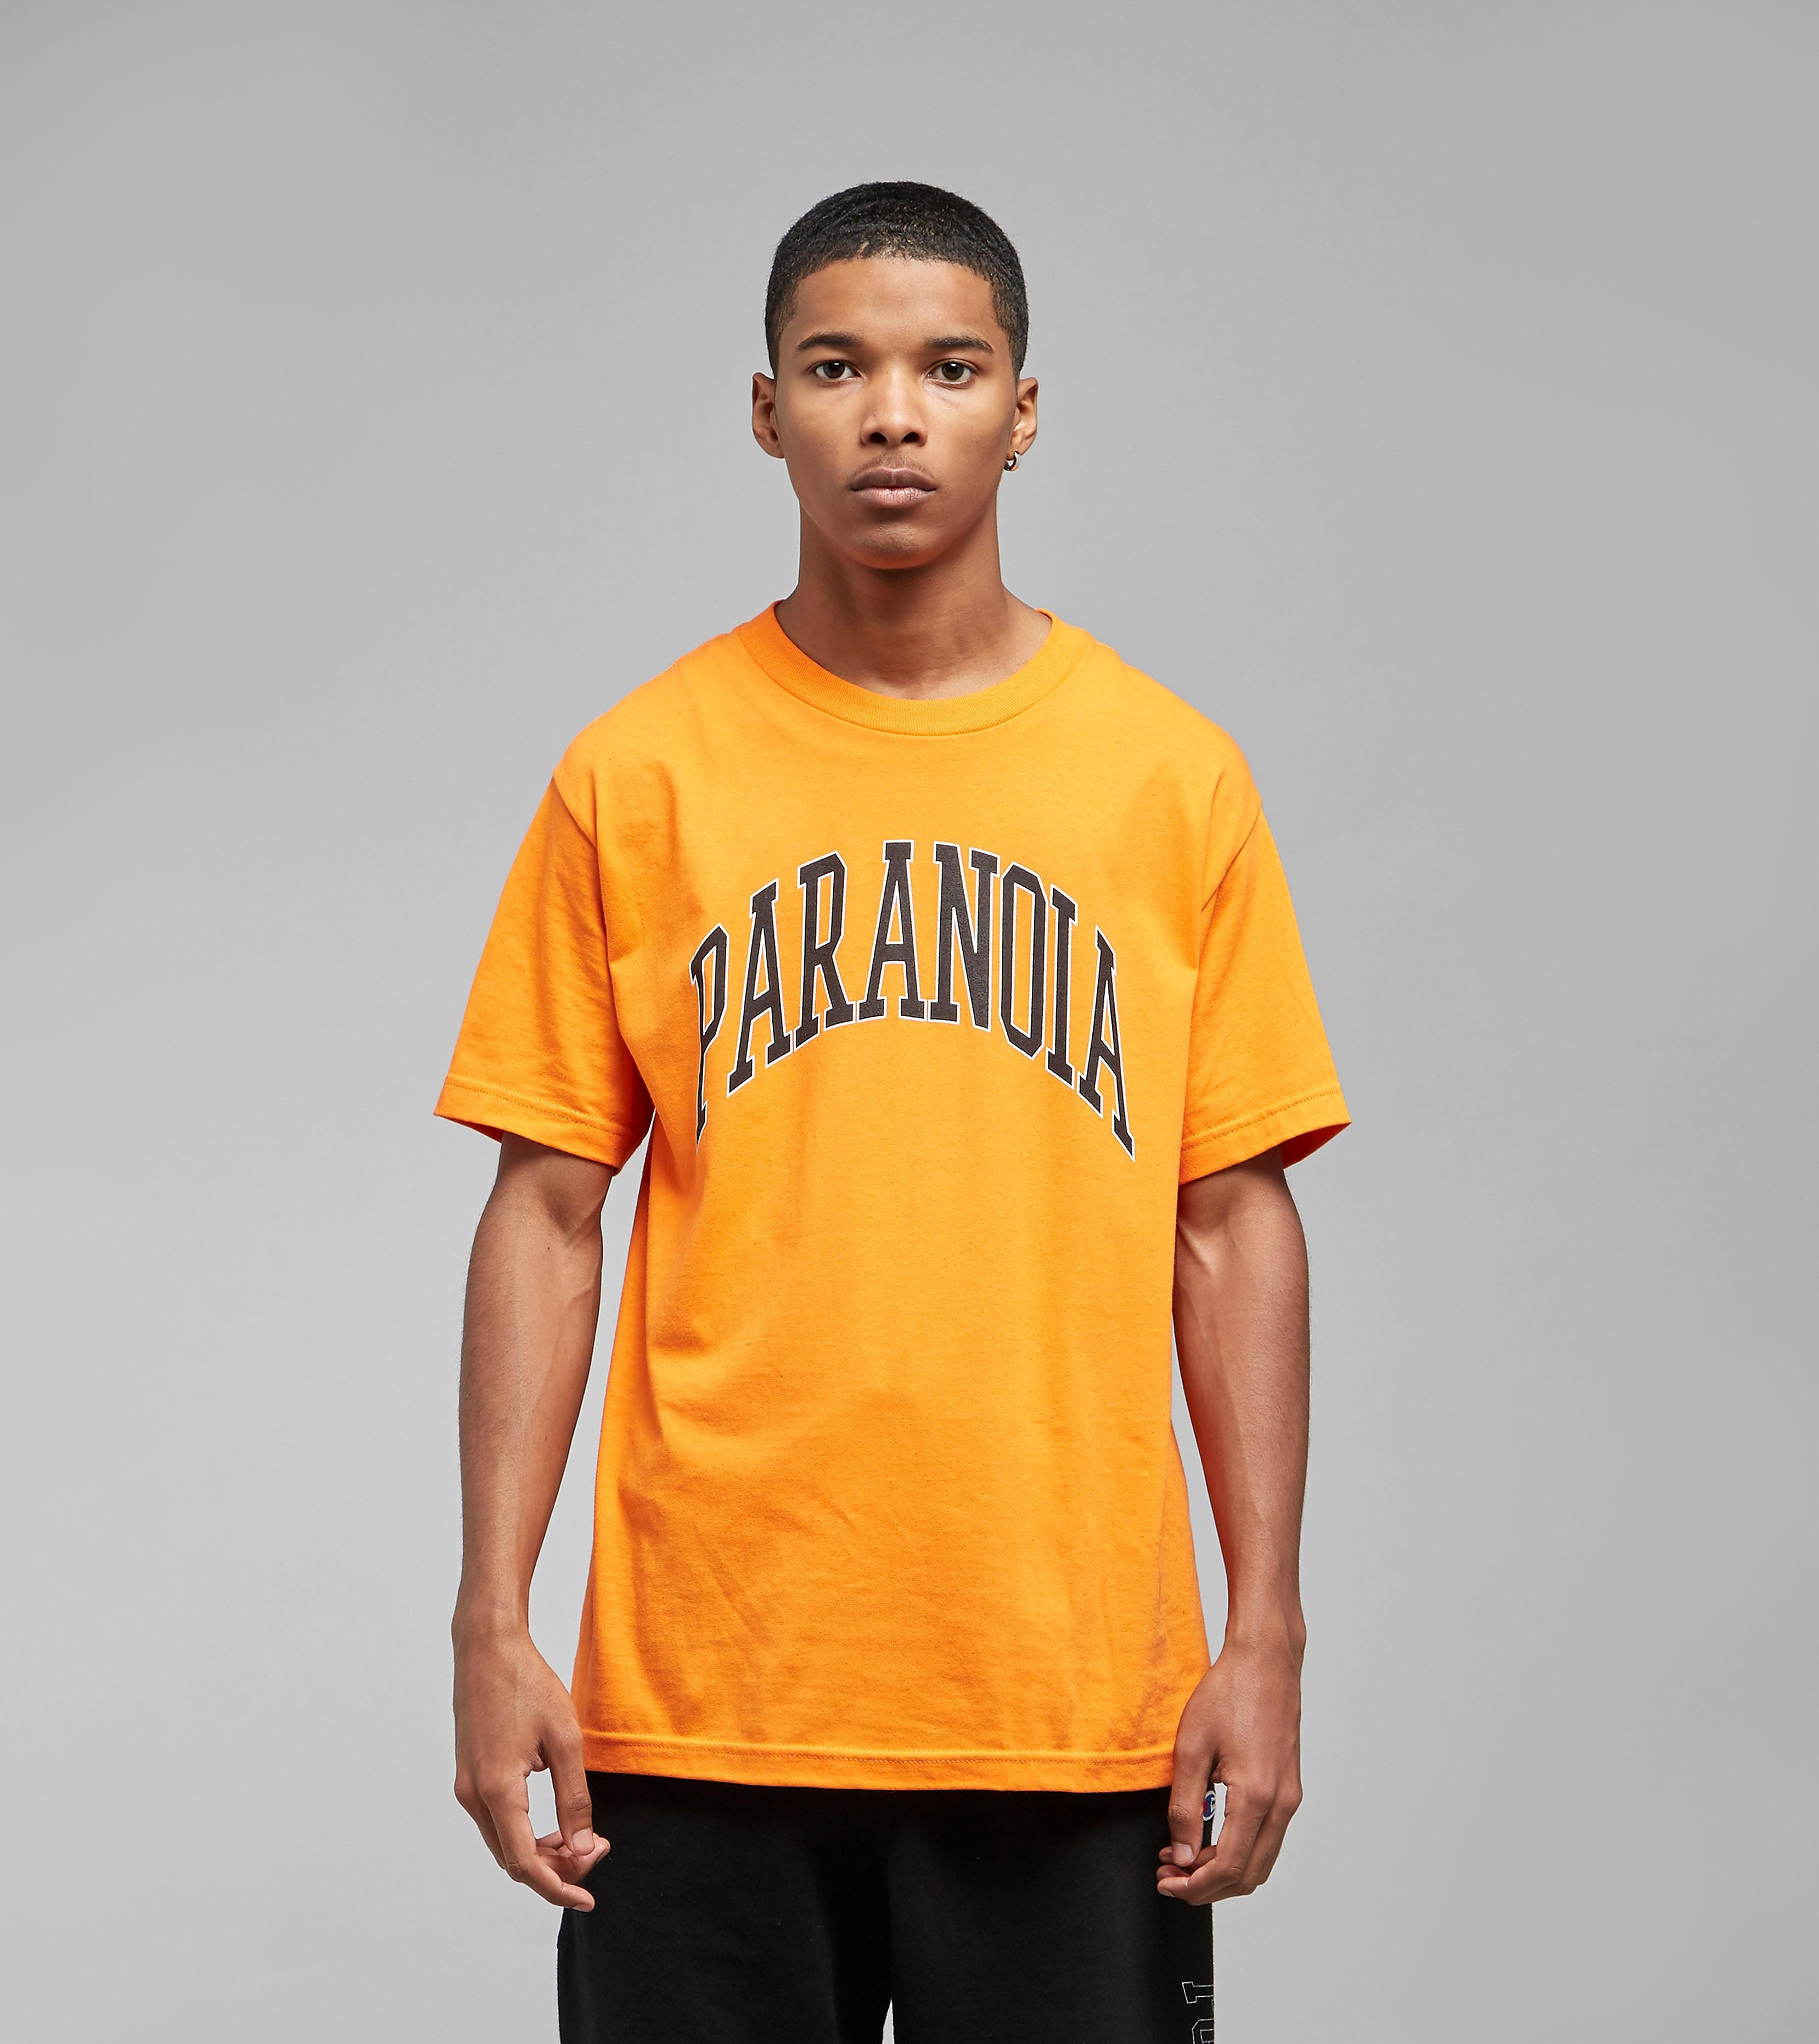 Foulplay Paranoia T-Shirt, Oranje